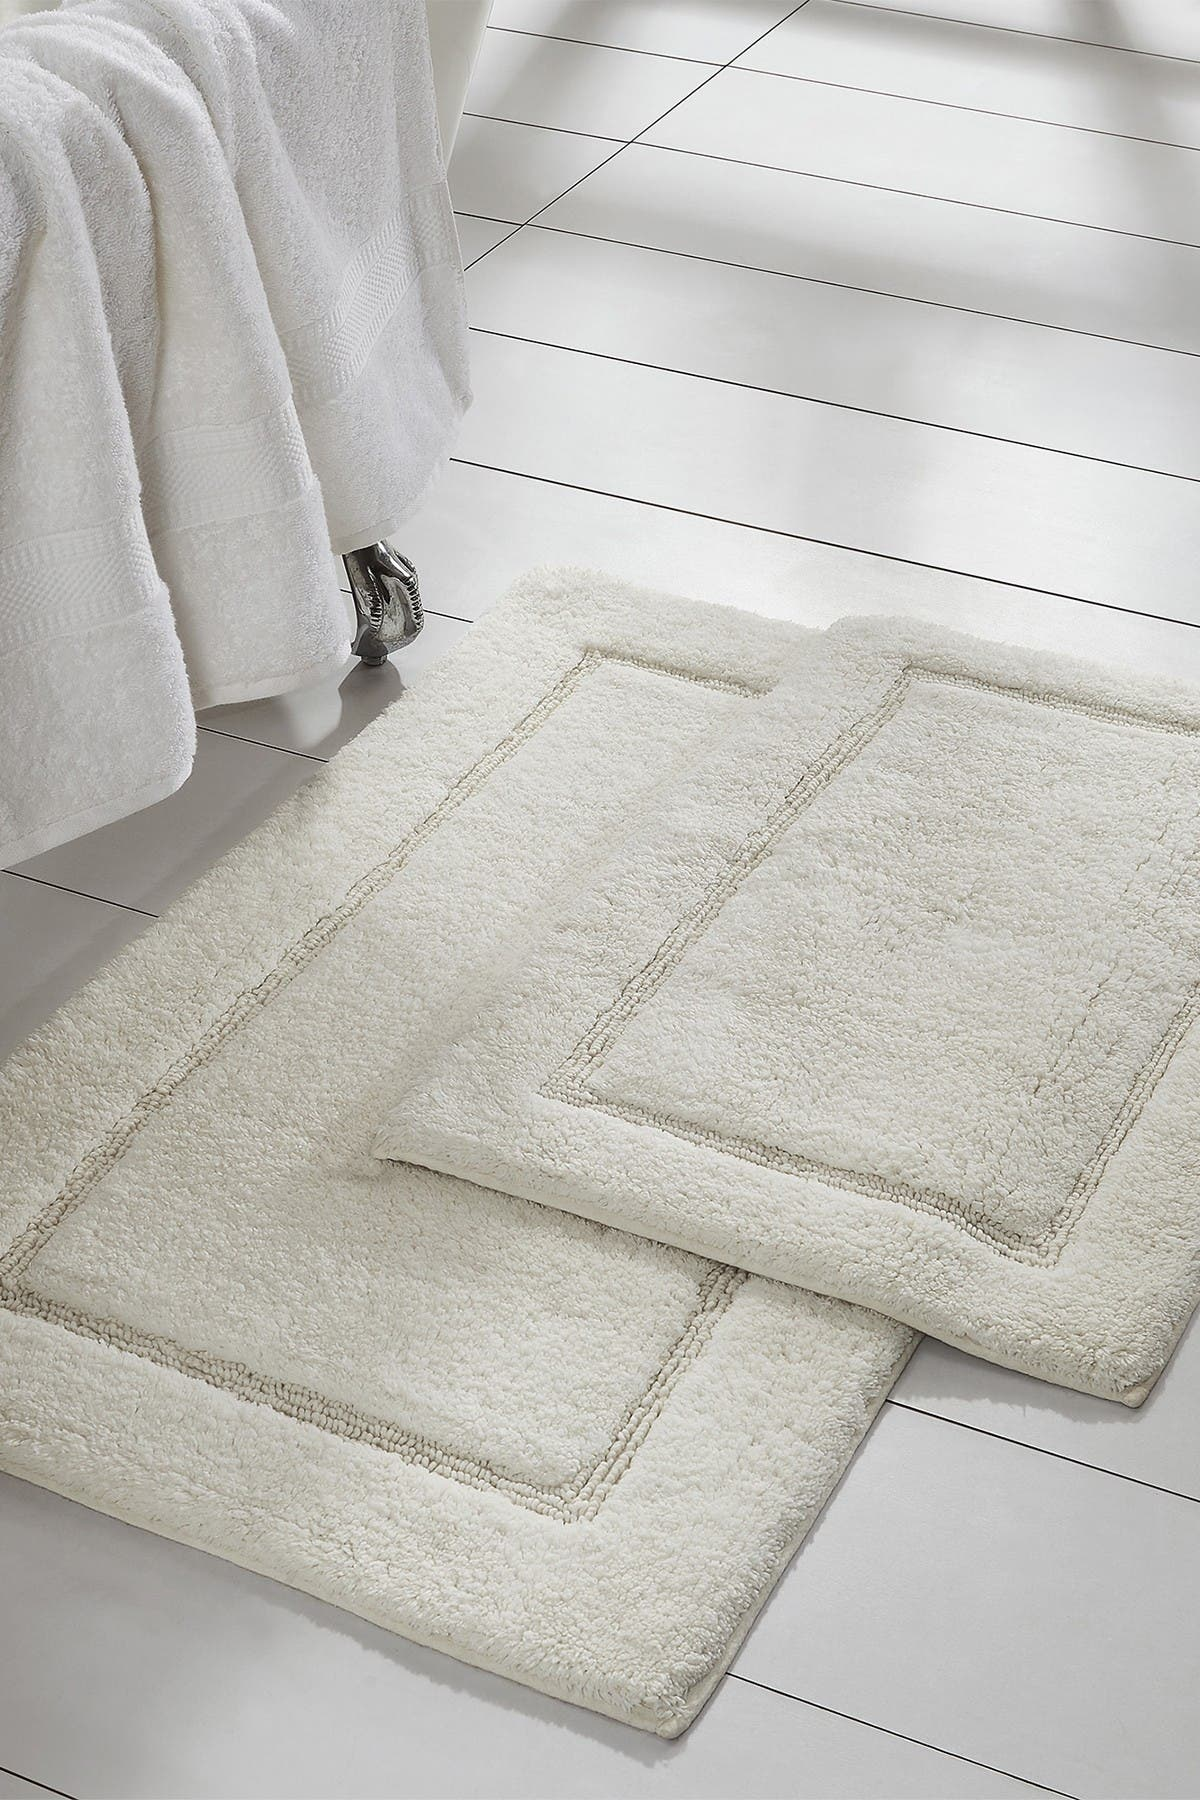 Image of Modern Threads White Solid Loop Non-Slip Bath Mat 2-Piece Set